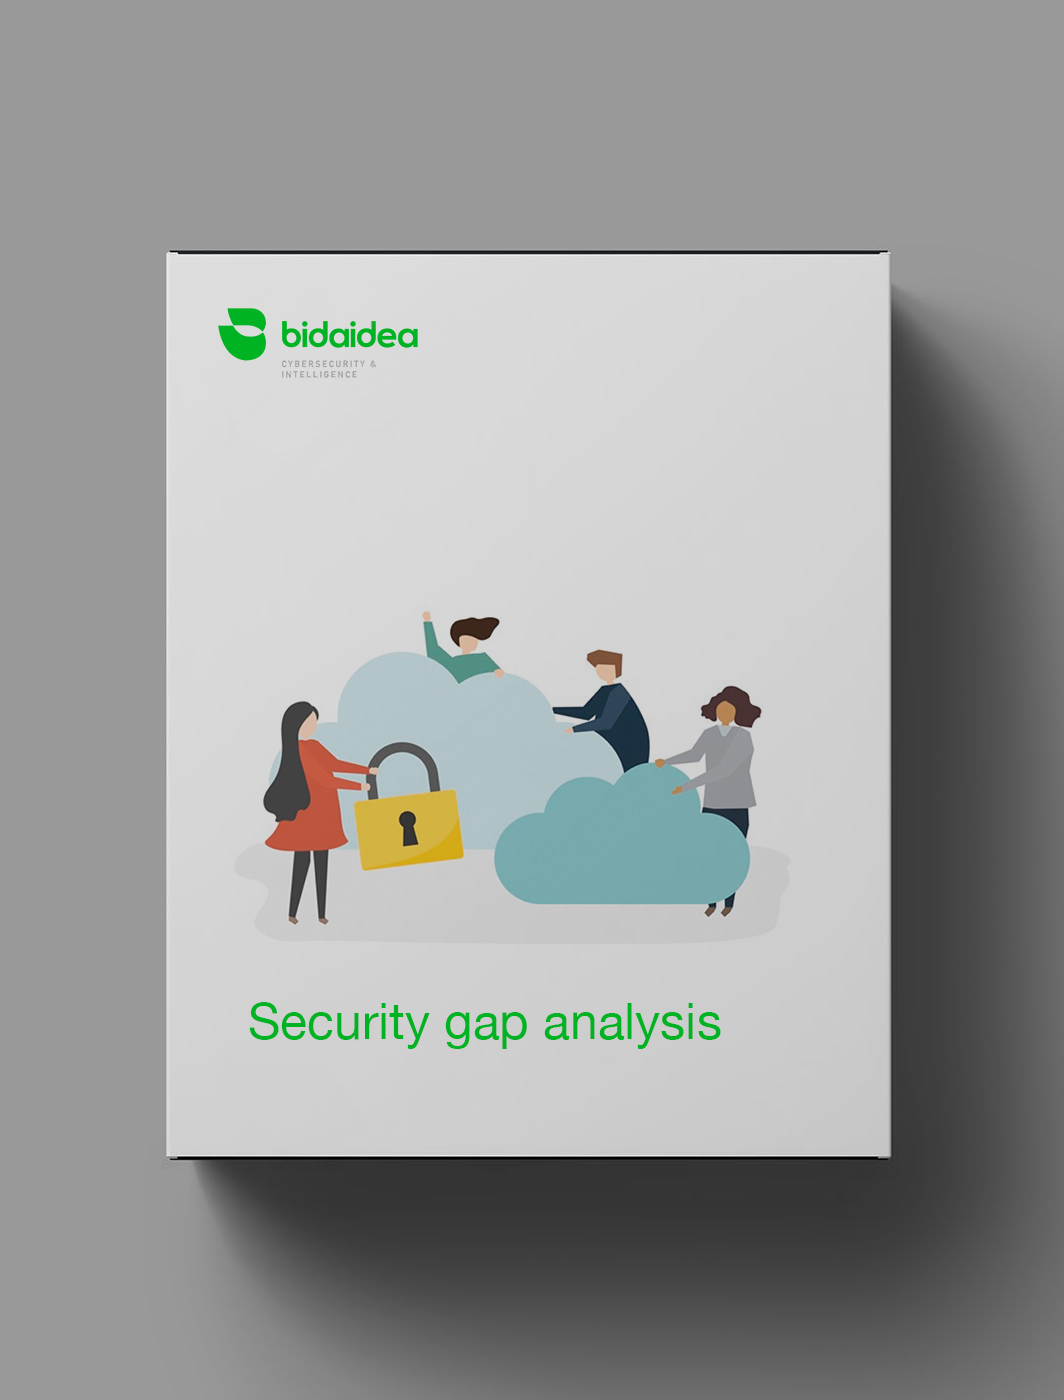 security gap analysis - Empresa de Ciberseguridad